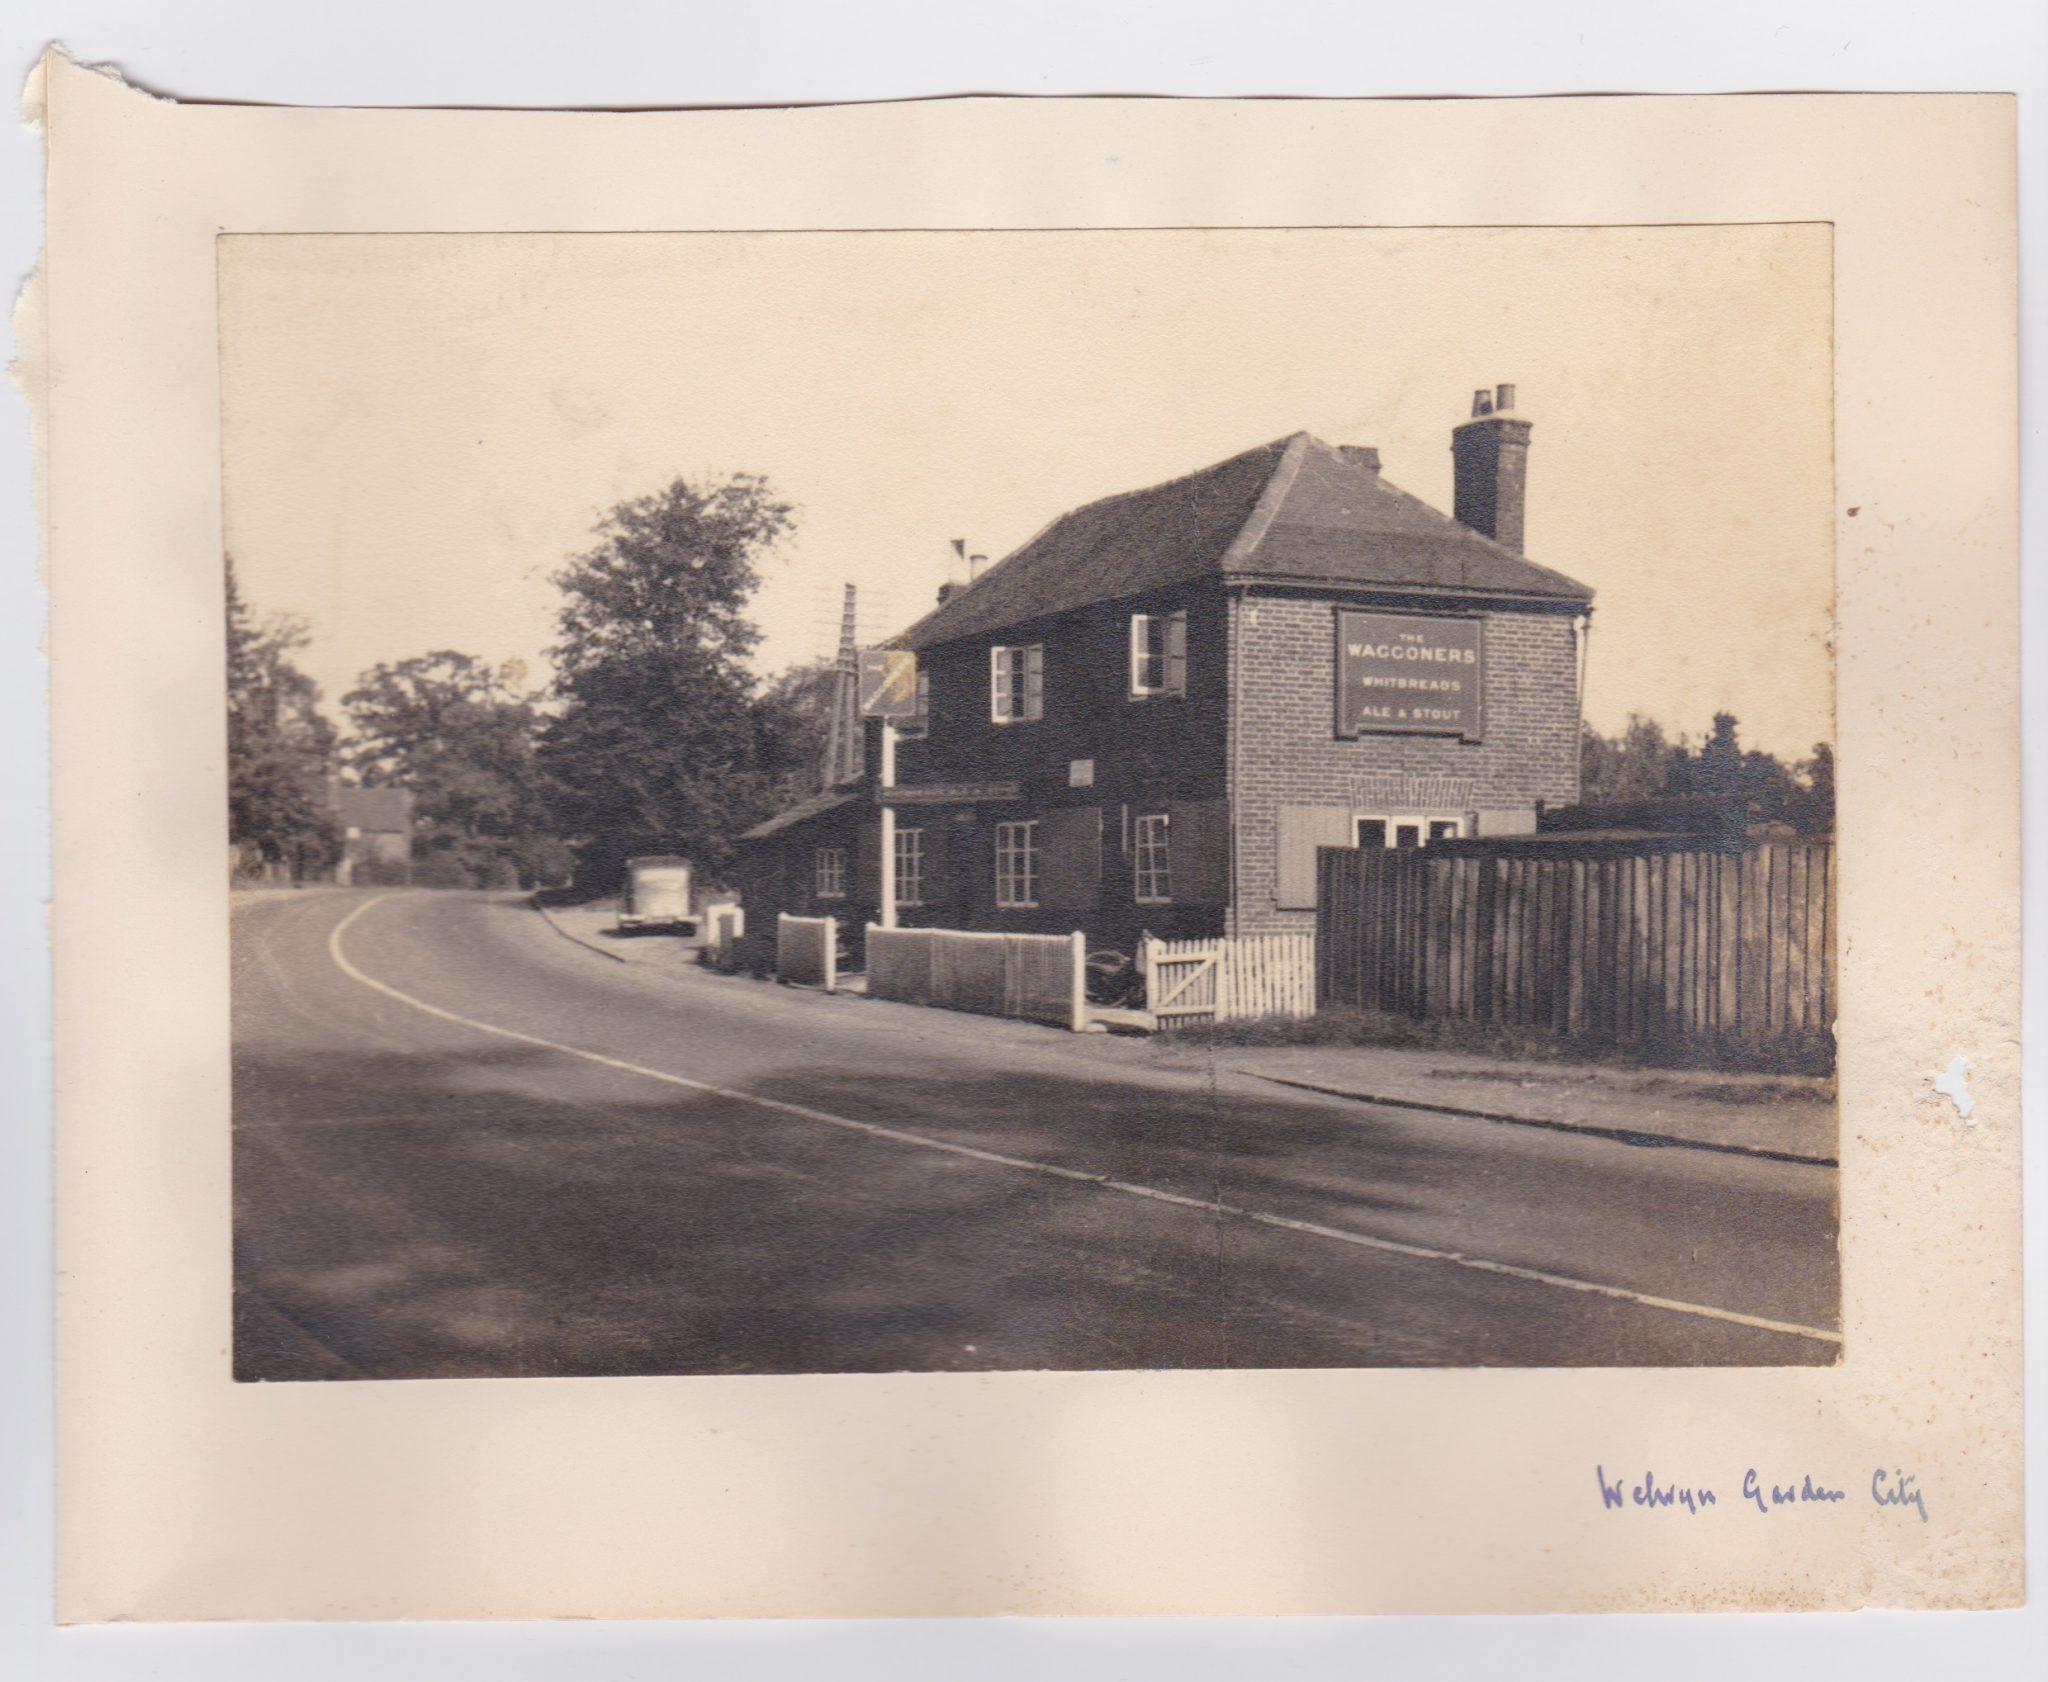 A Pub History Scrapbook Archive 52